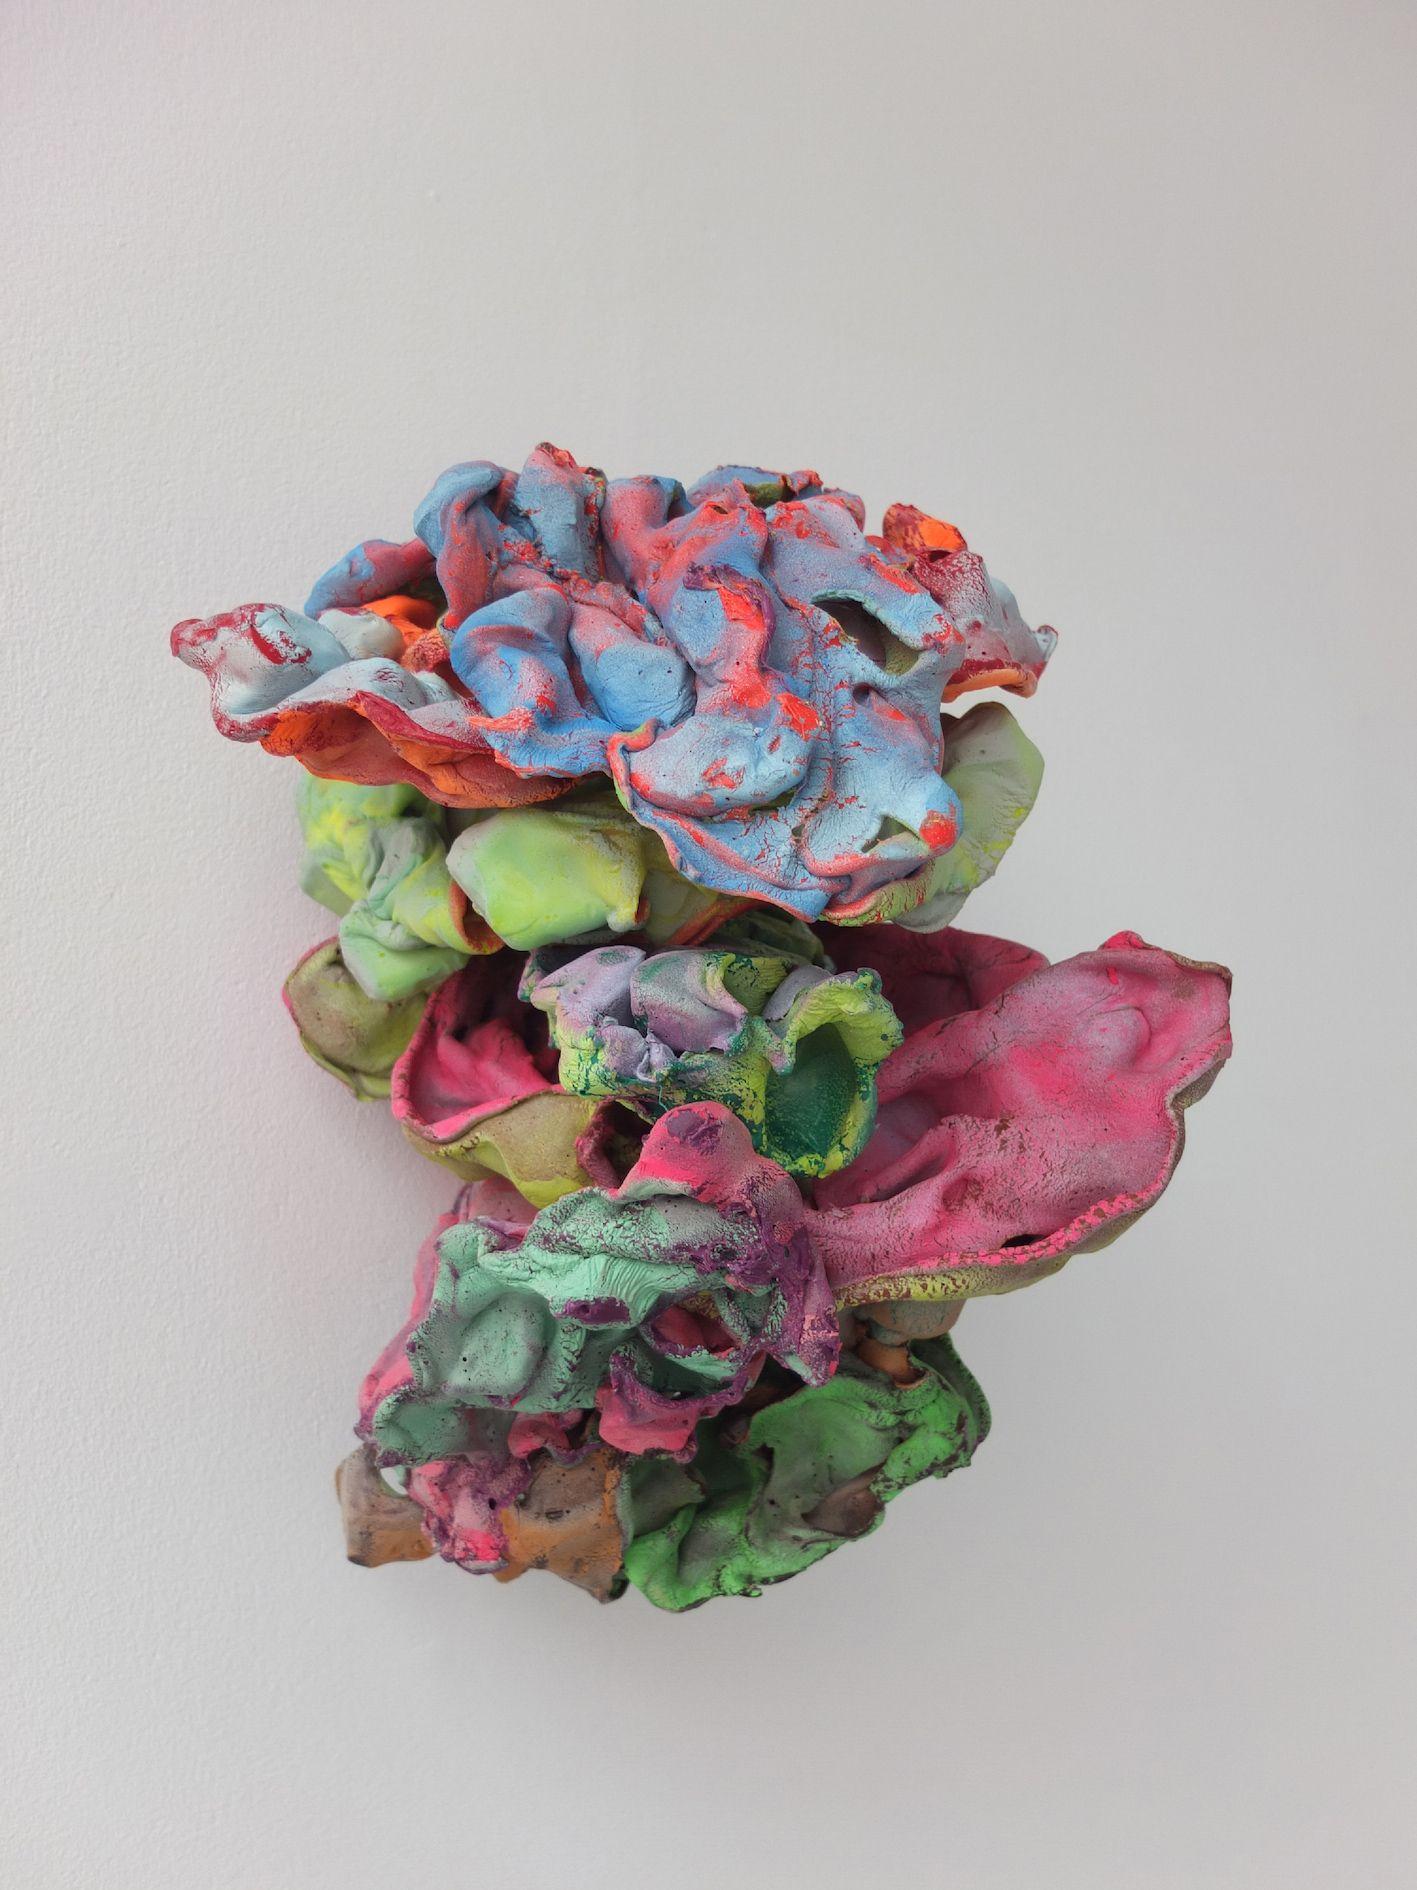 012-samuel-aligand-mue-2015-plastique-pigment-et-peinture-32x25x31cm-2ec2047d8d68b81796cefba20b7178e3